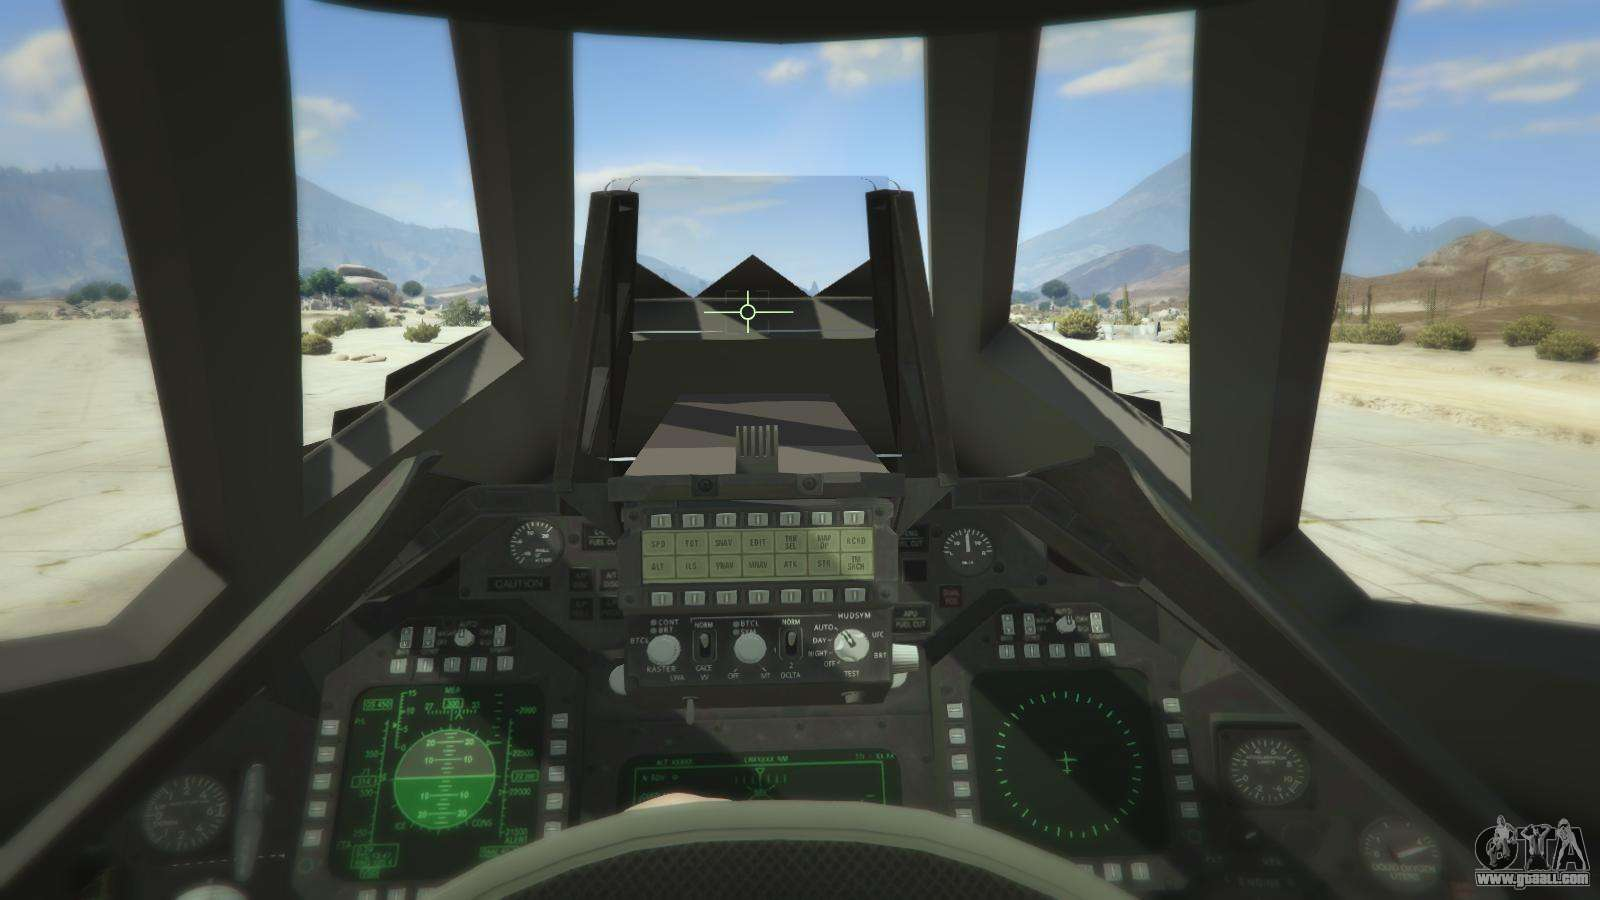 F 117 Stealth Fighter Cockpit Lockheed F-117 Nightha...